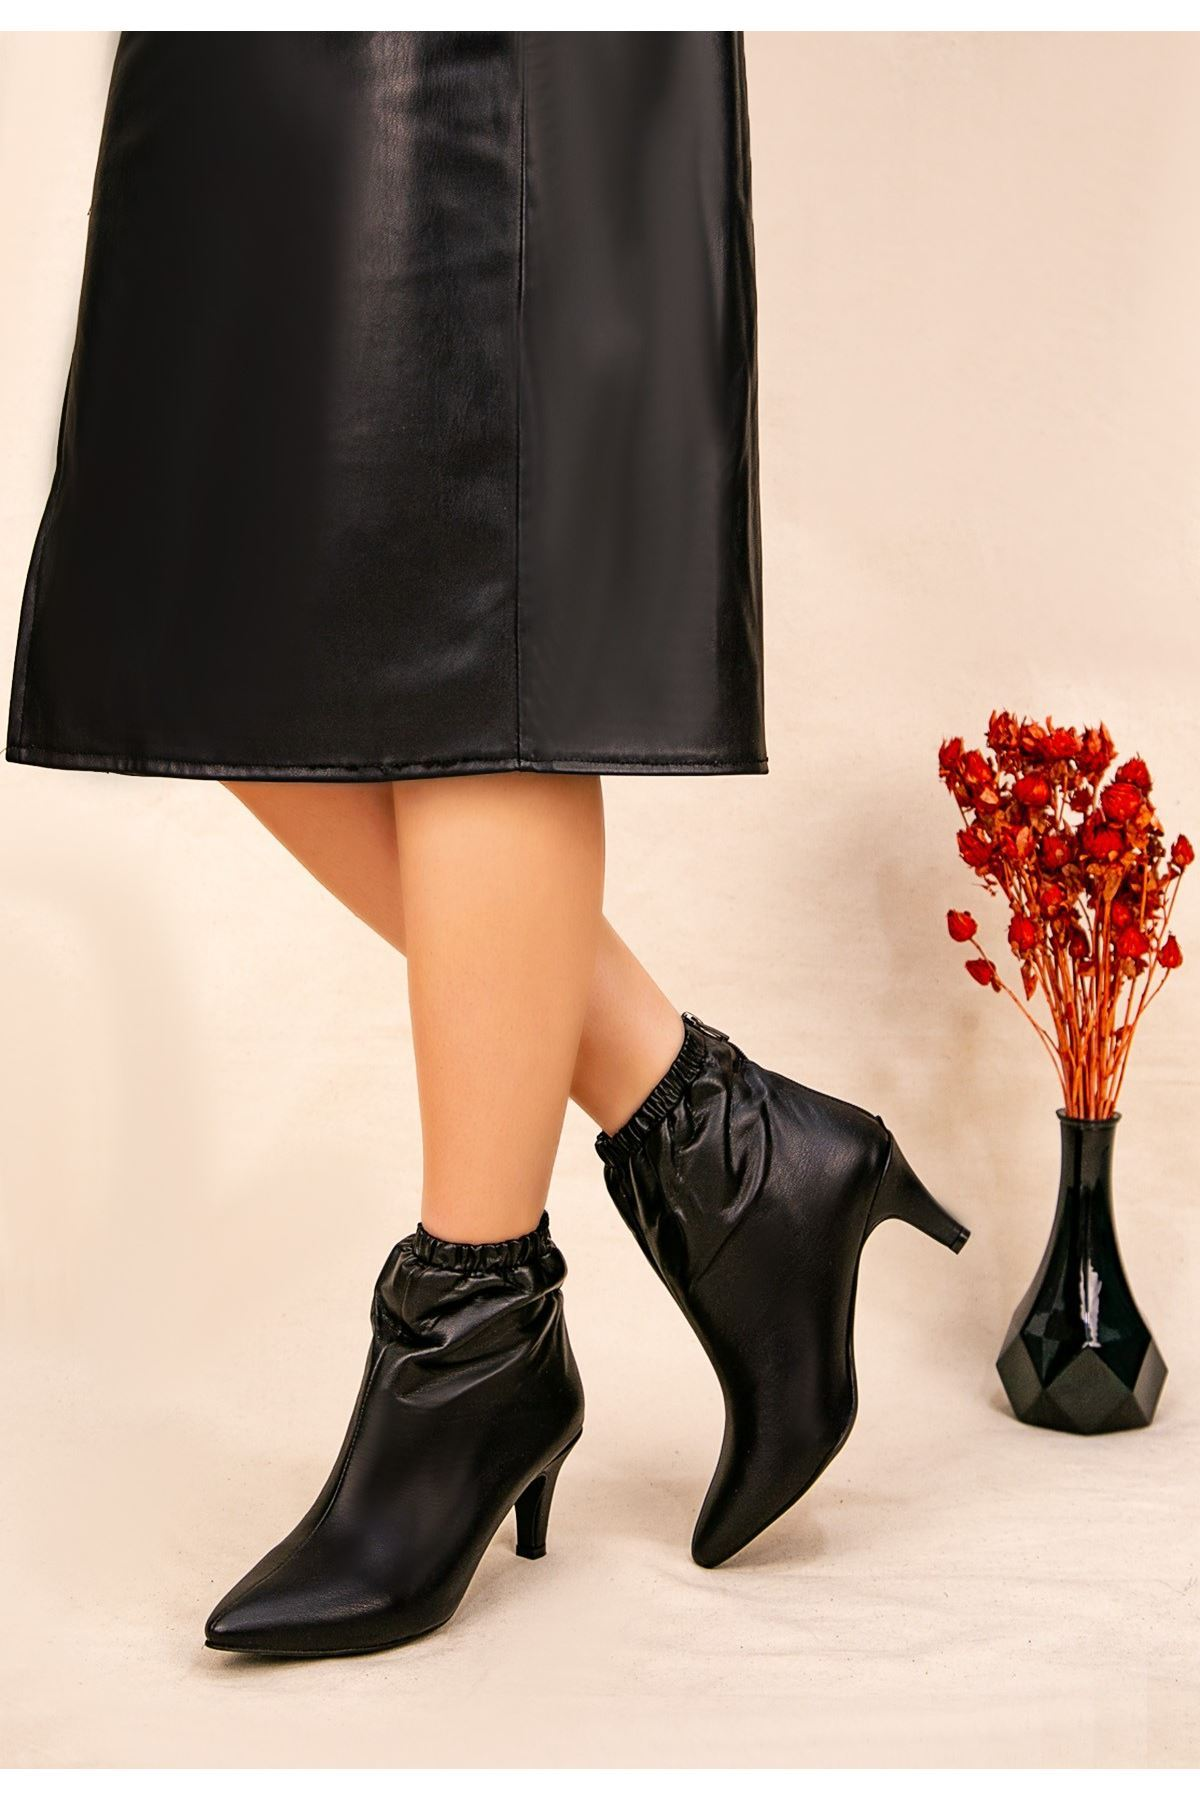 Ava Siyah Cilt Topuklu Bot